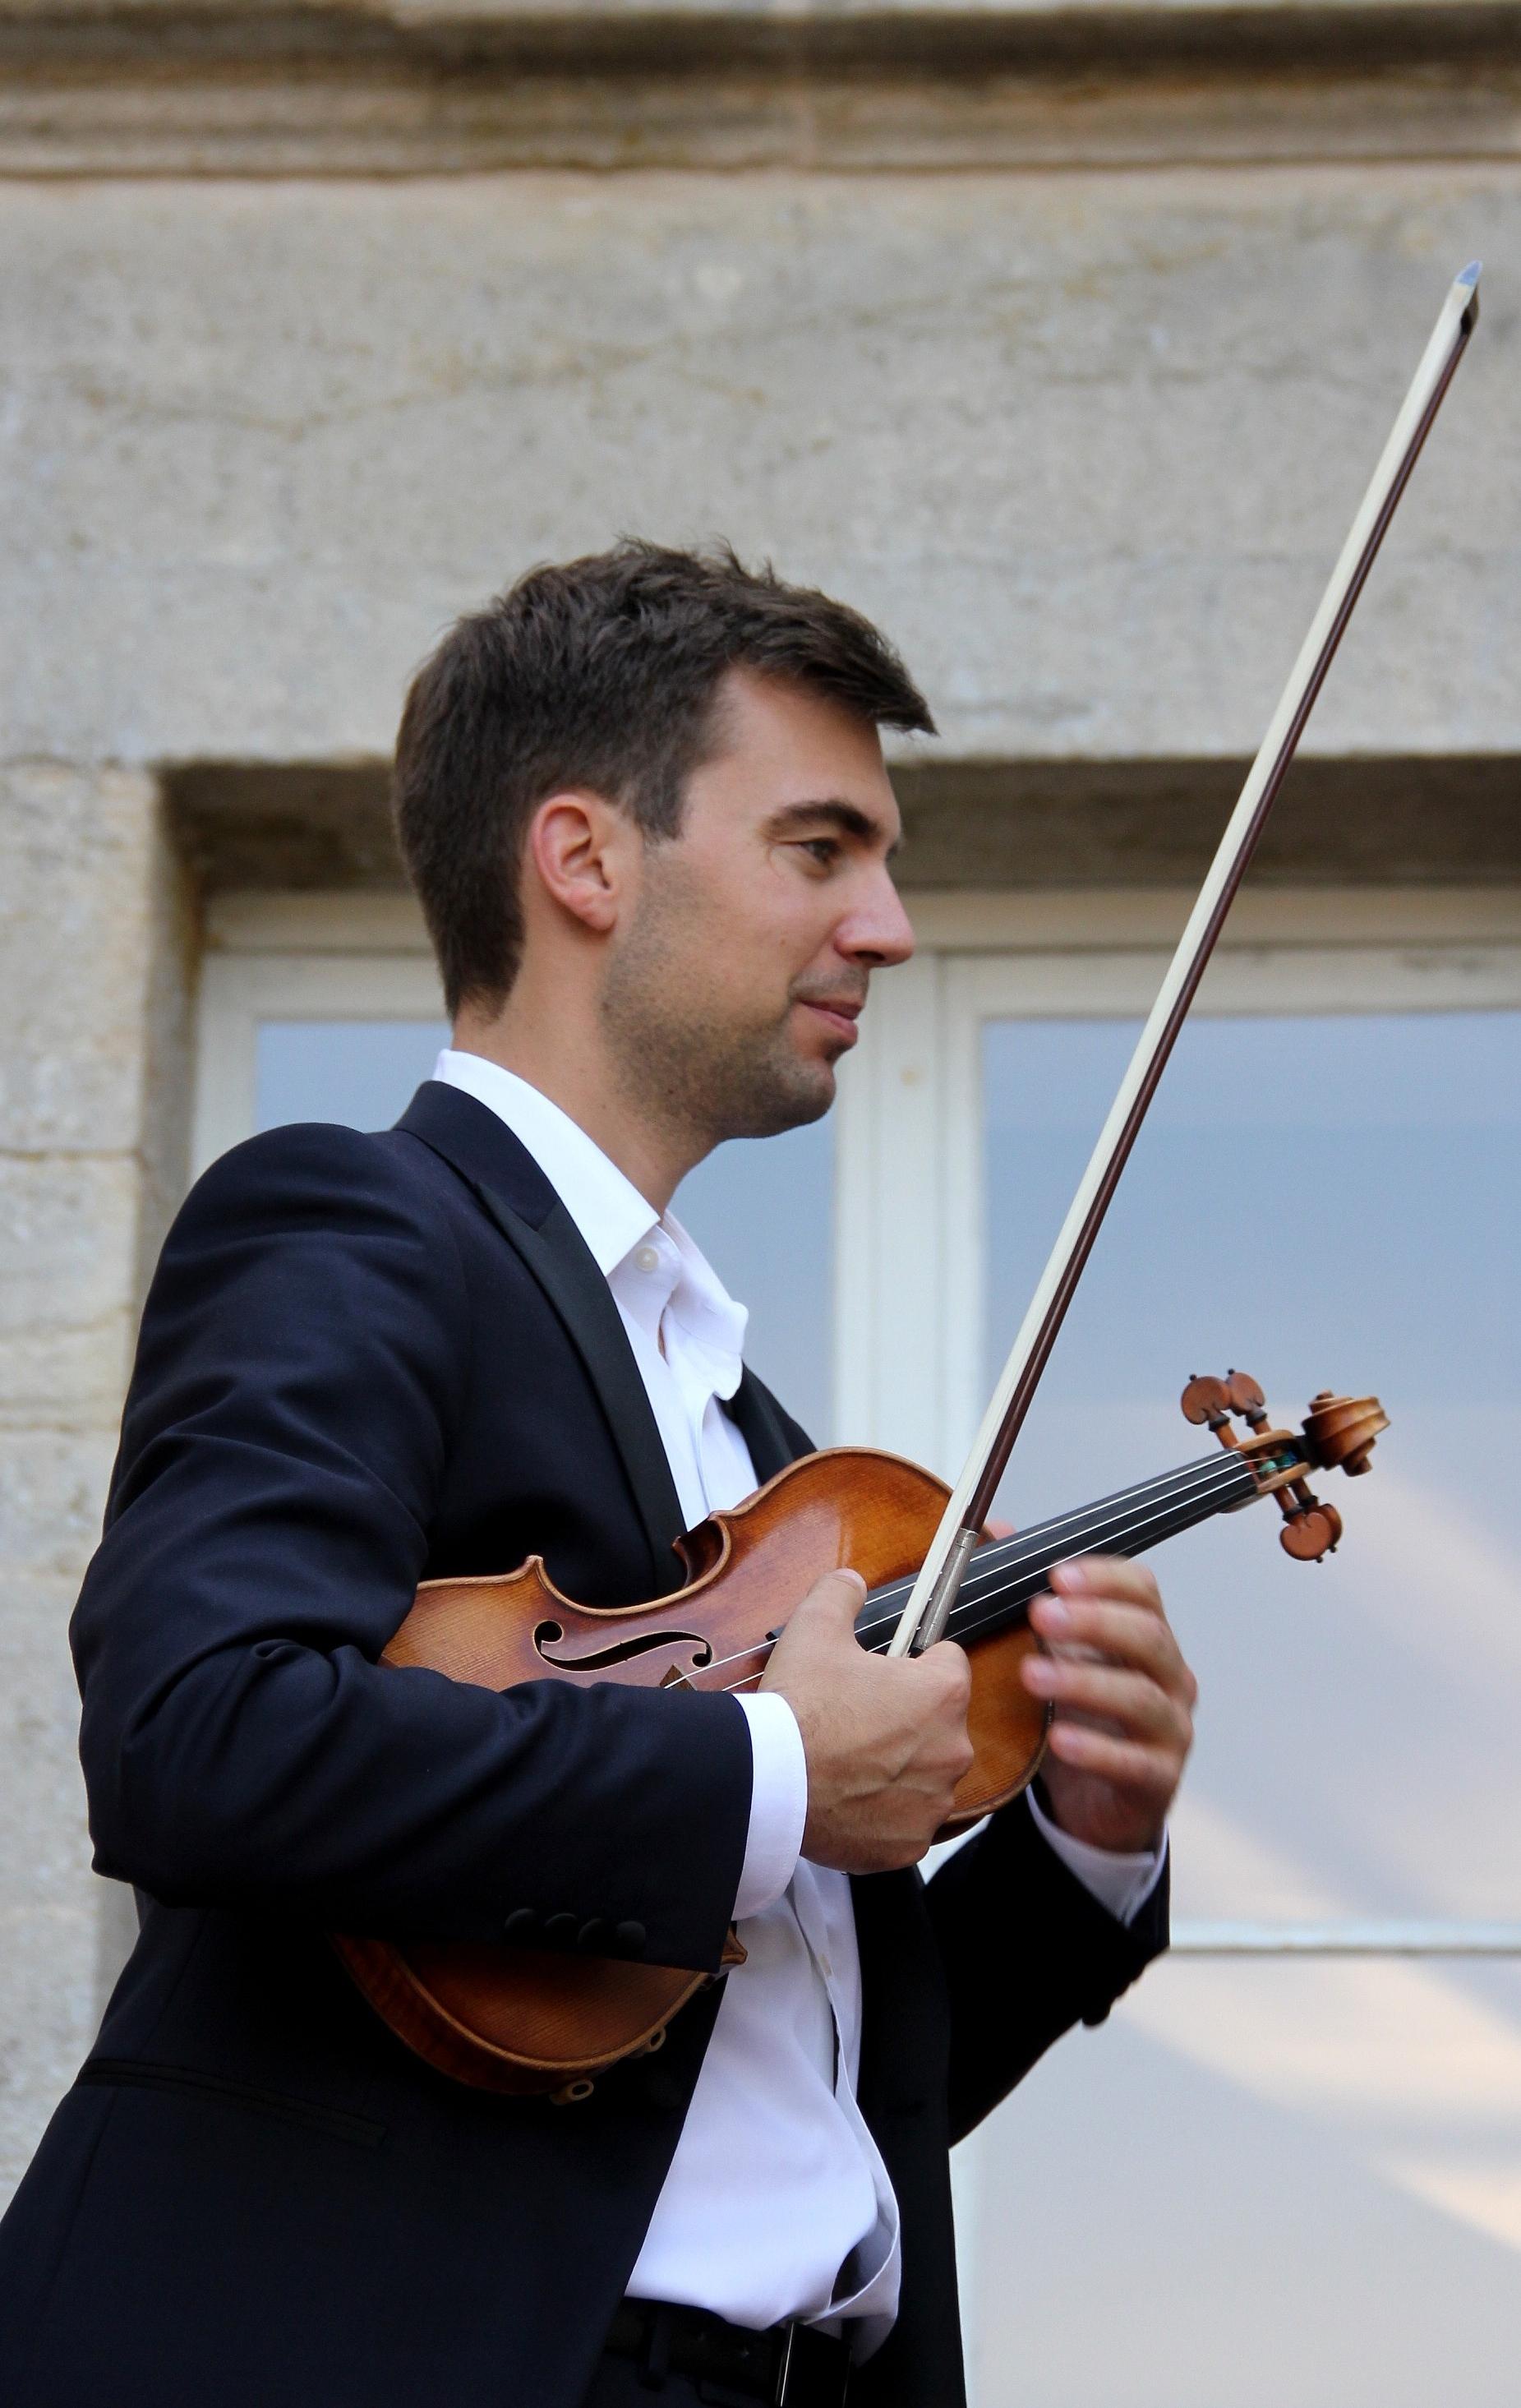 Mathieu Handtschoewercker, du Trio Chausson